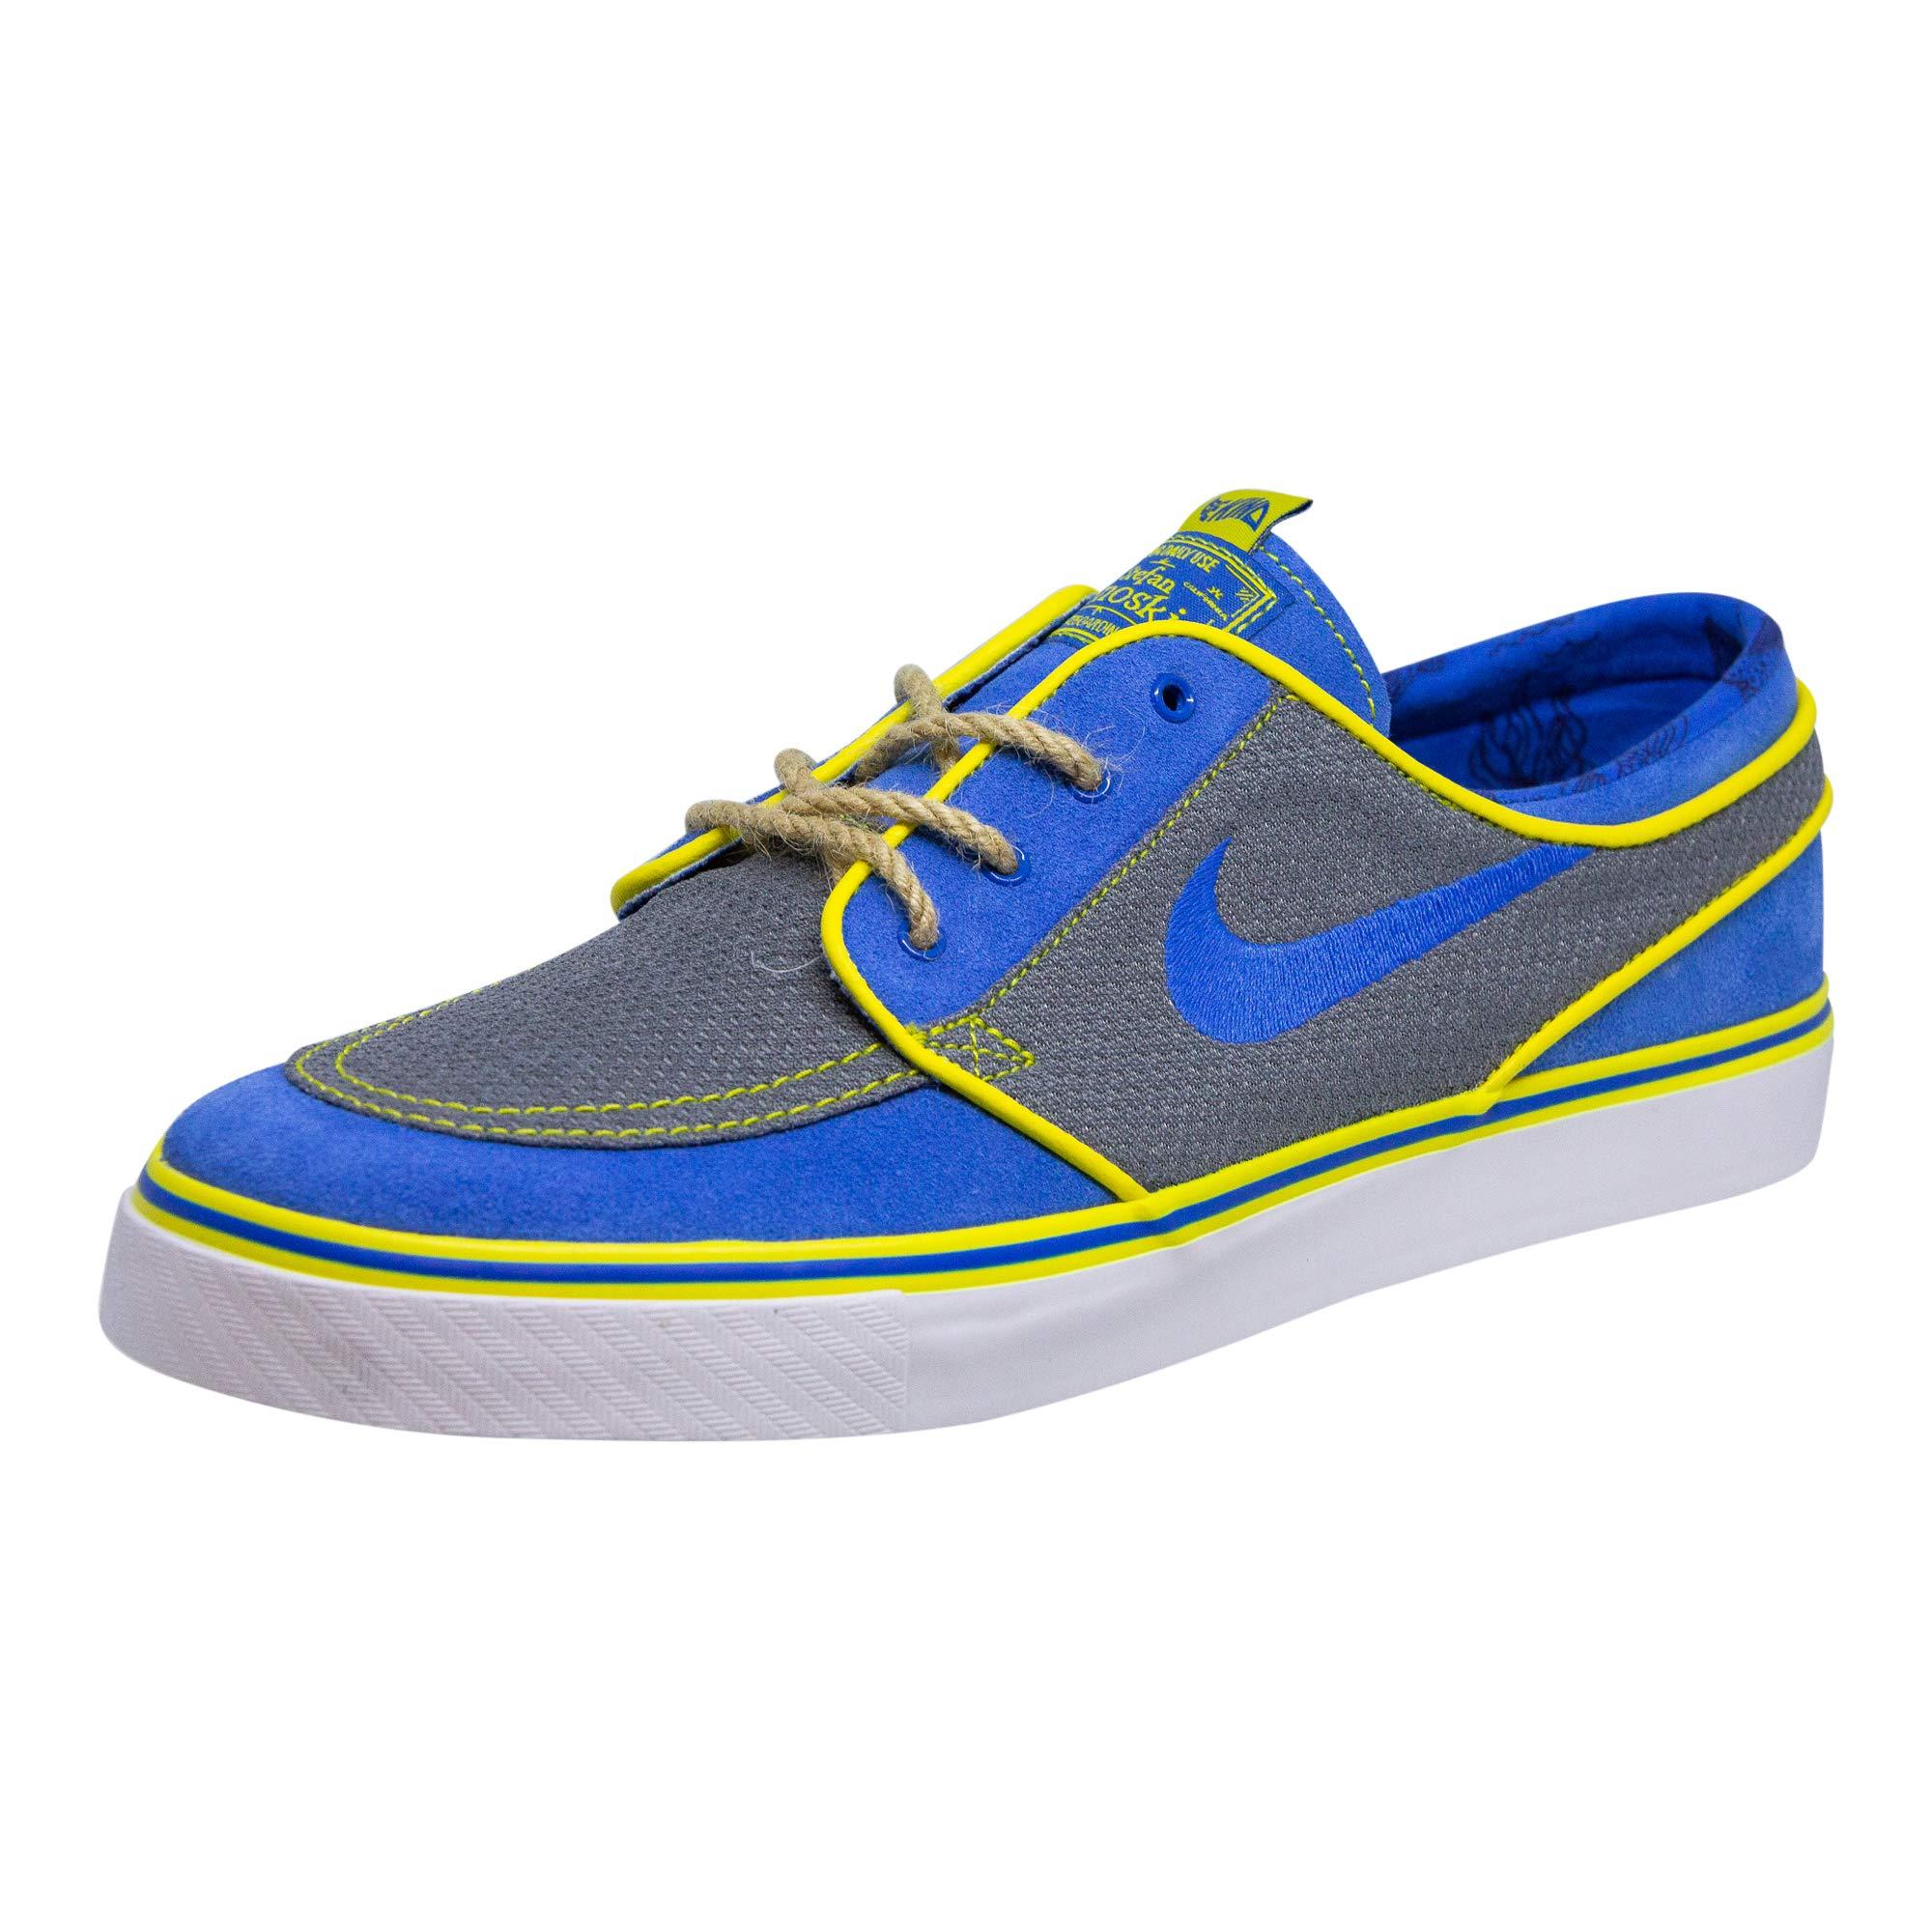 quality design 8cc64 ecc28 Galleon - NIKE Zoom Stefan Janoski DB Men s Skate Shoes (Battle Blue Battle  Blue, 11 M US)